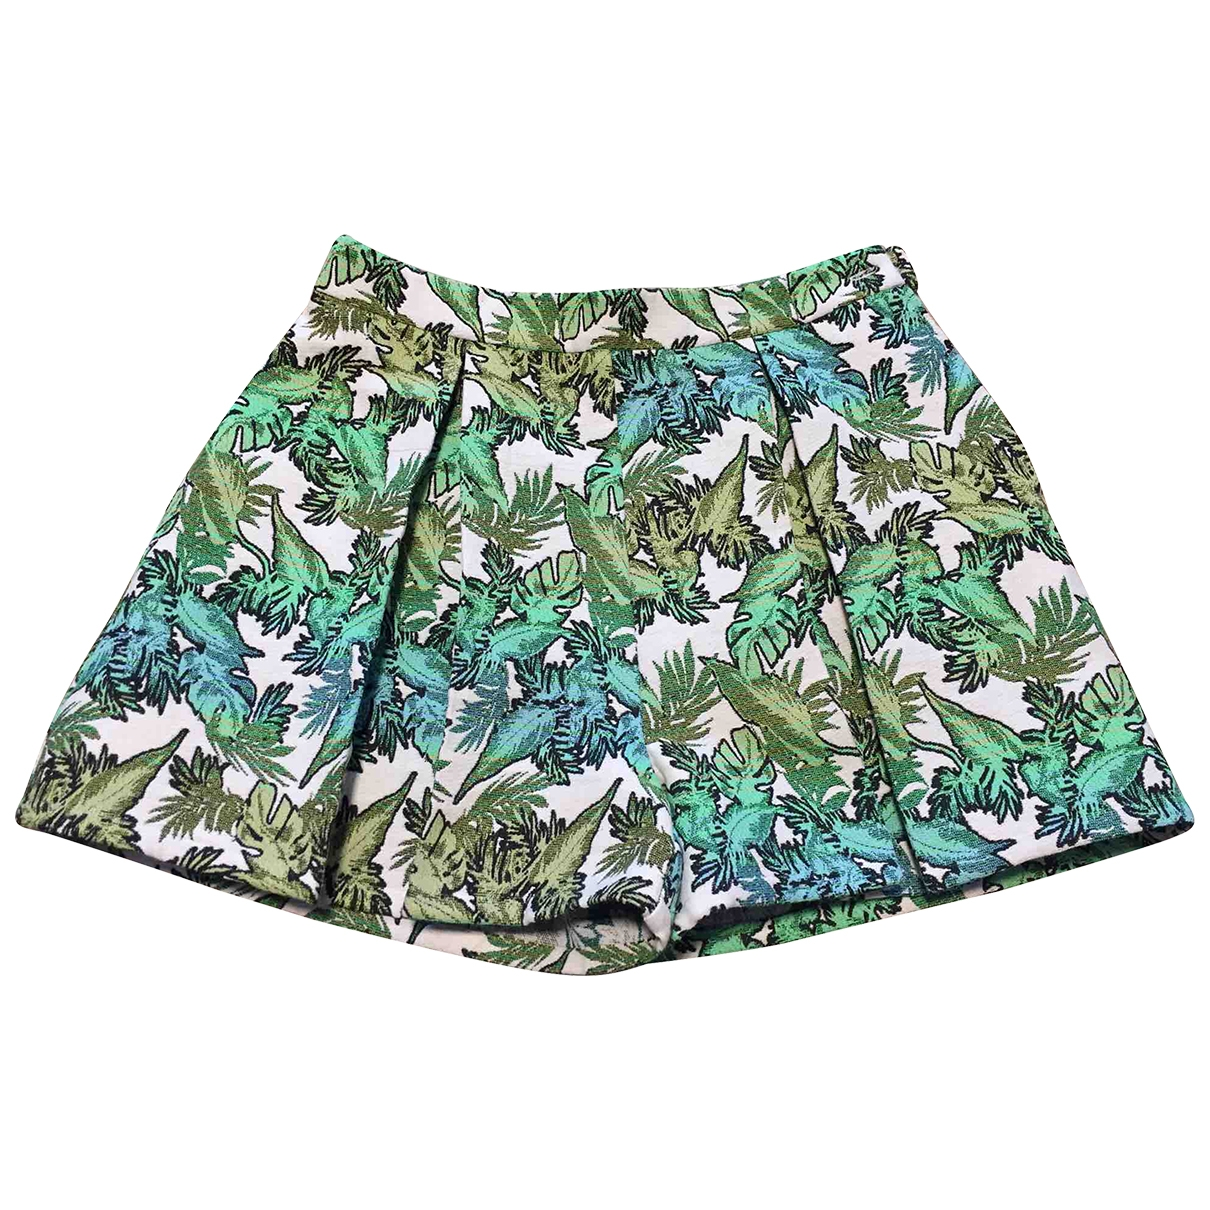 Department 5 \N Green Cotton Shorts for Women S International